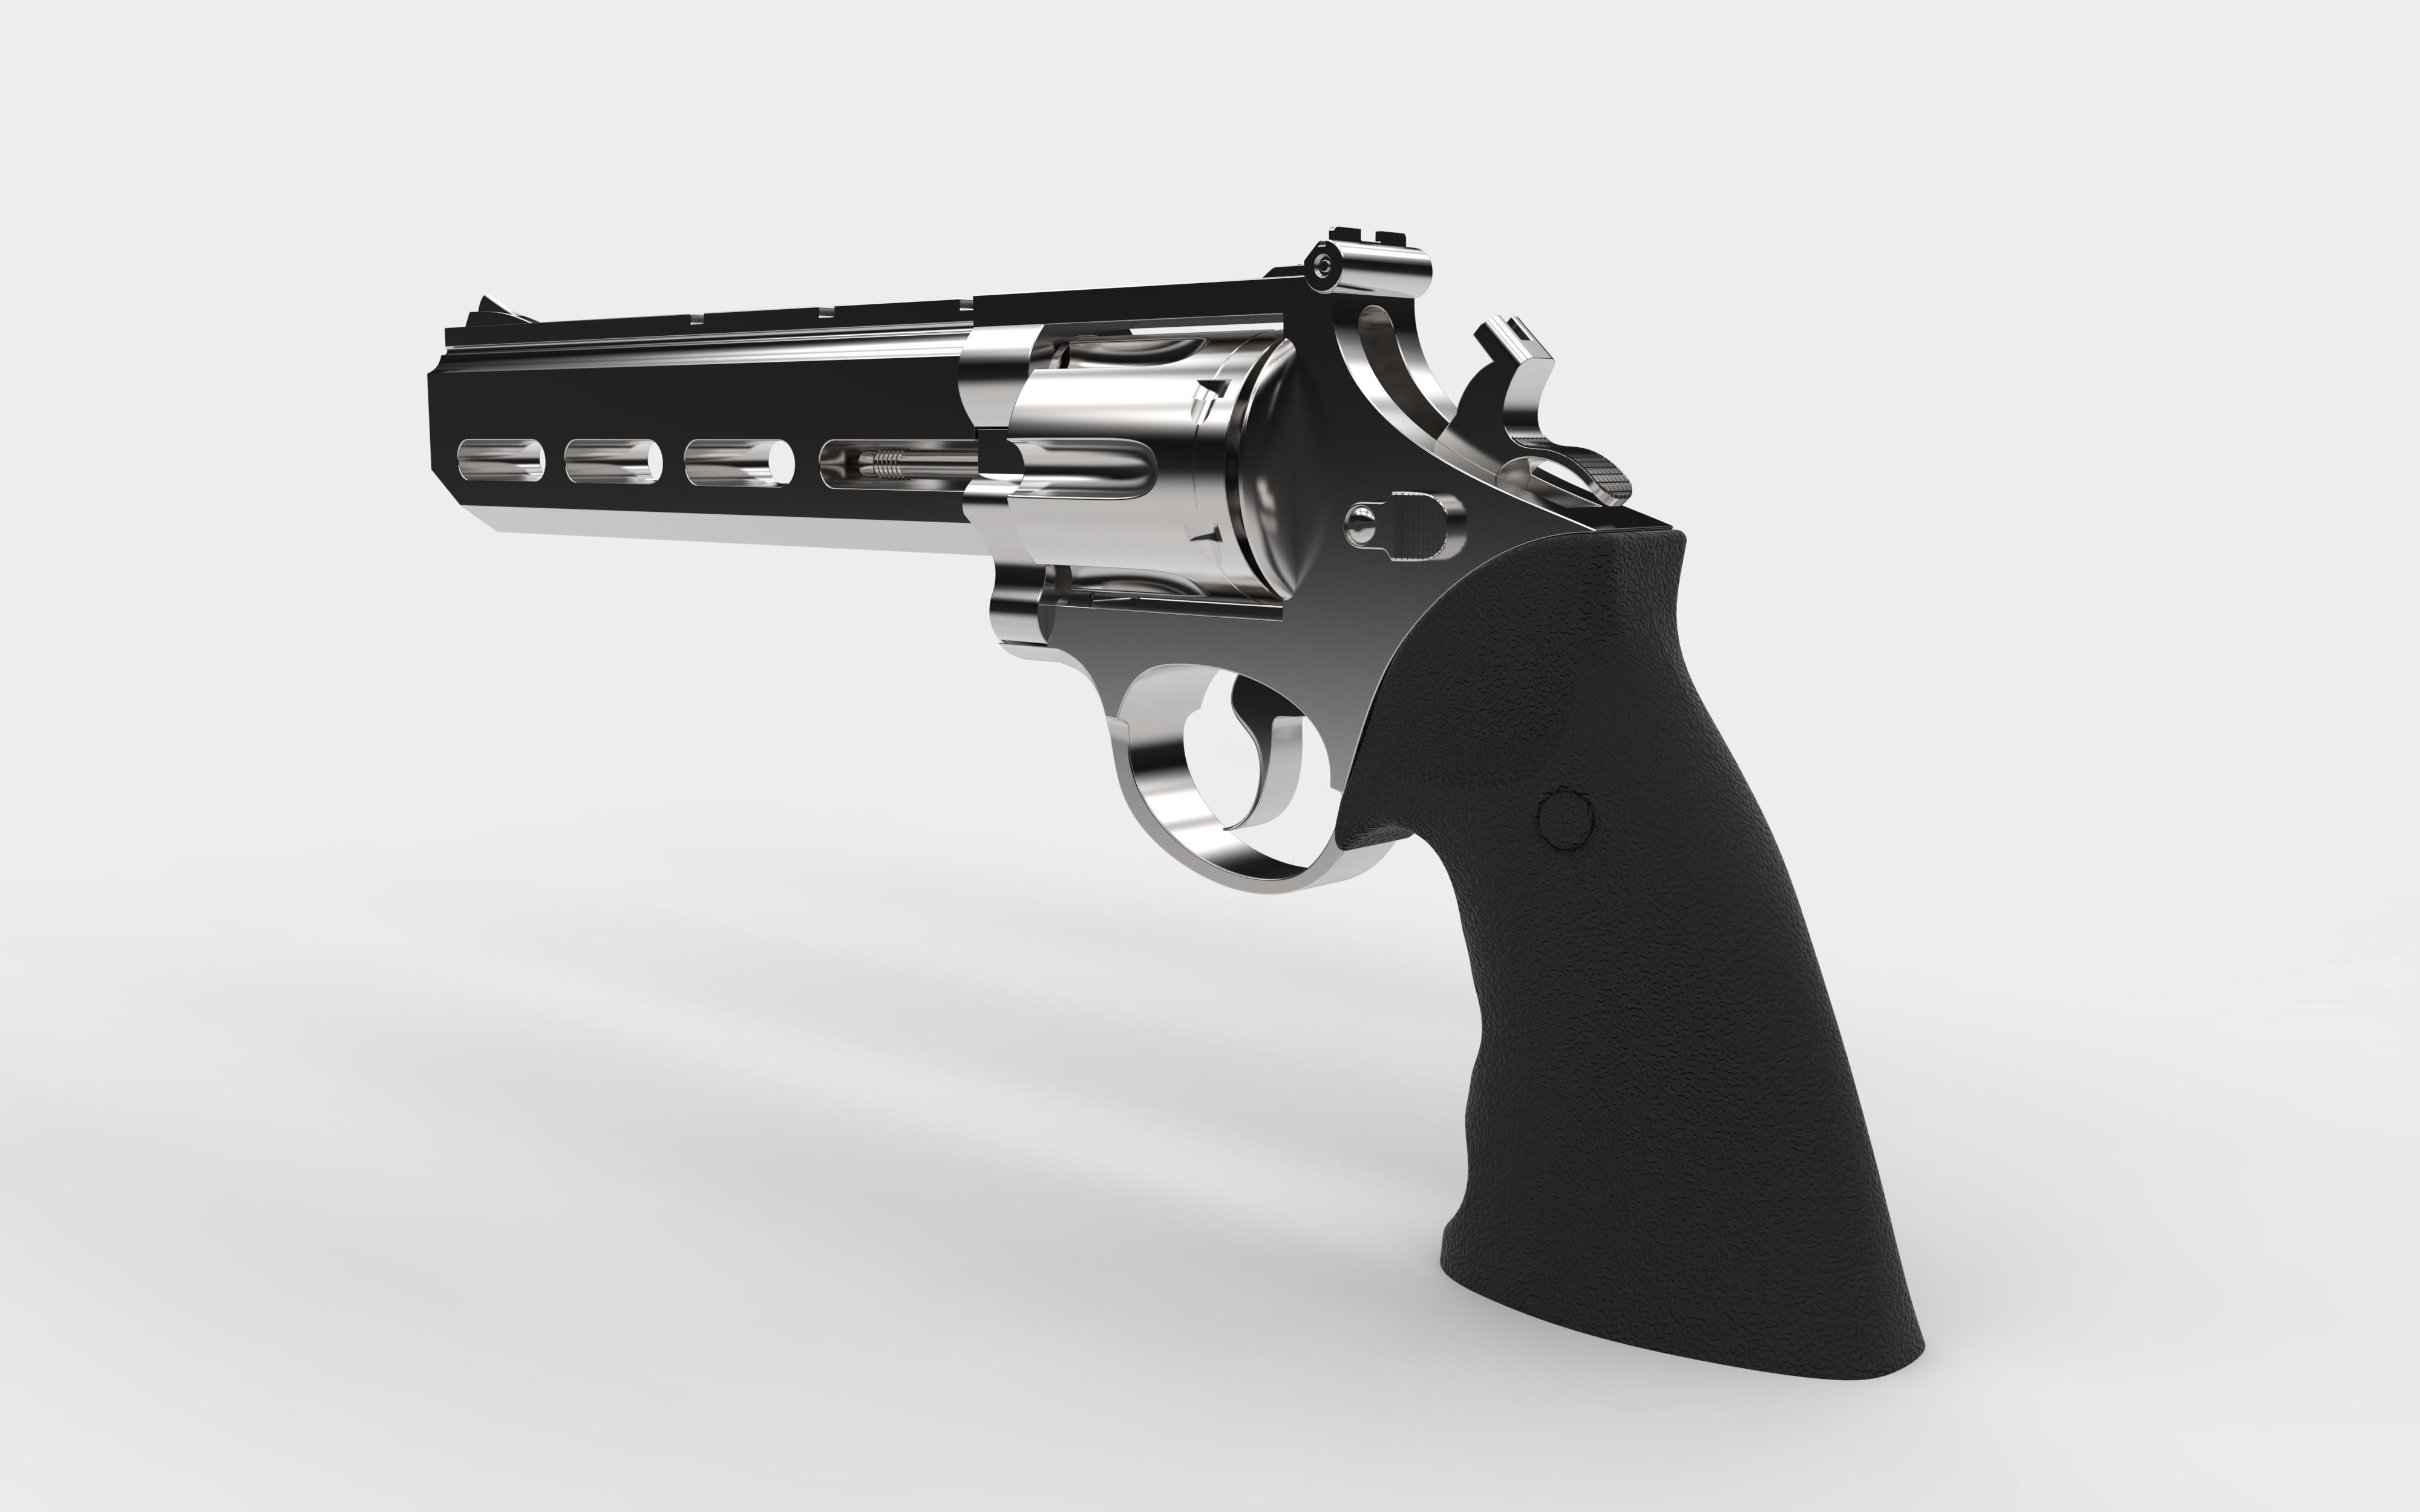 Kellogg's Pistol Rendering.469